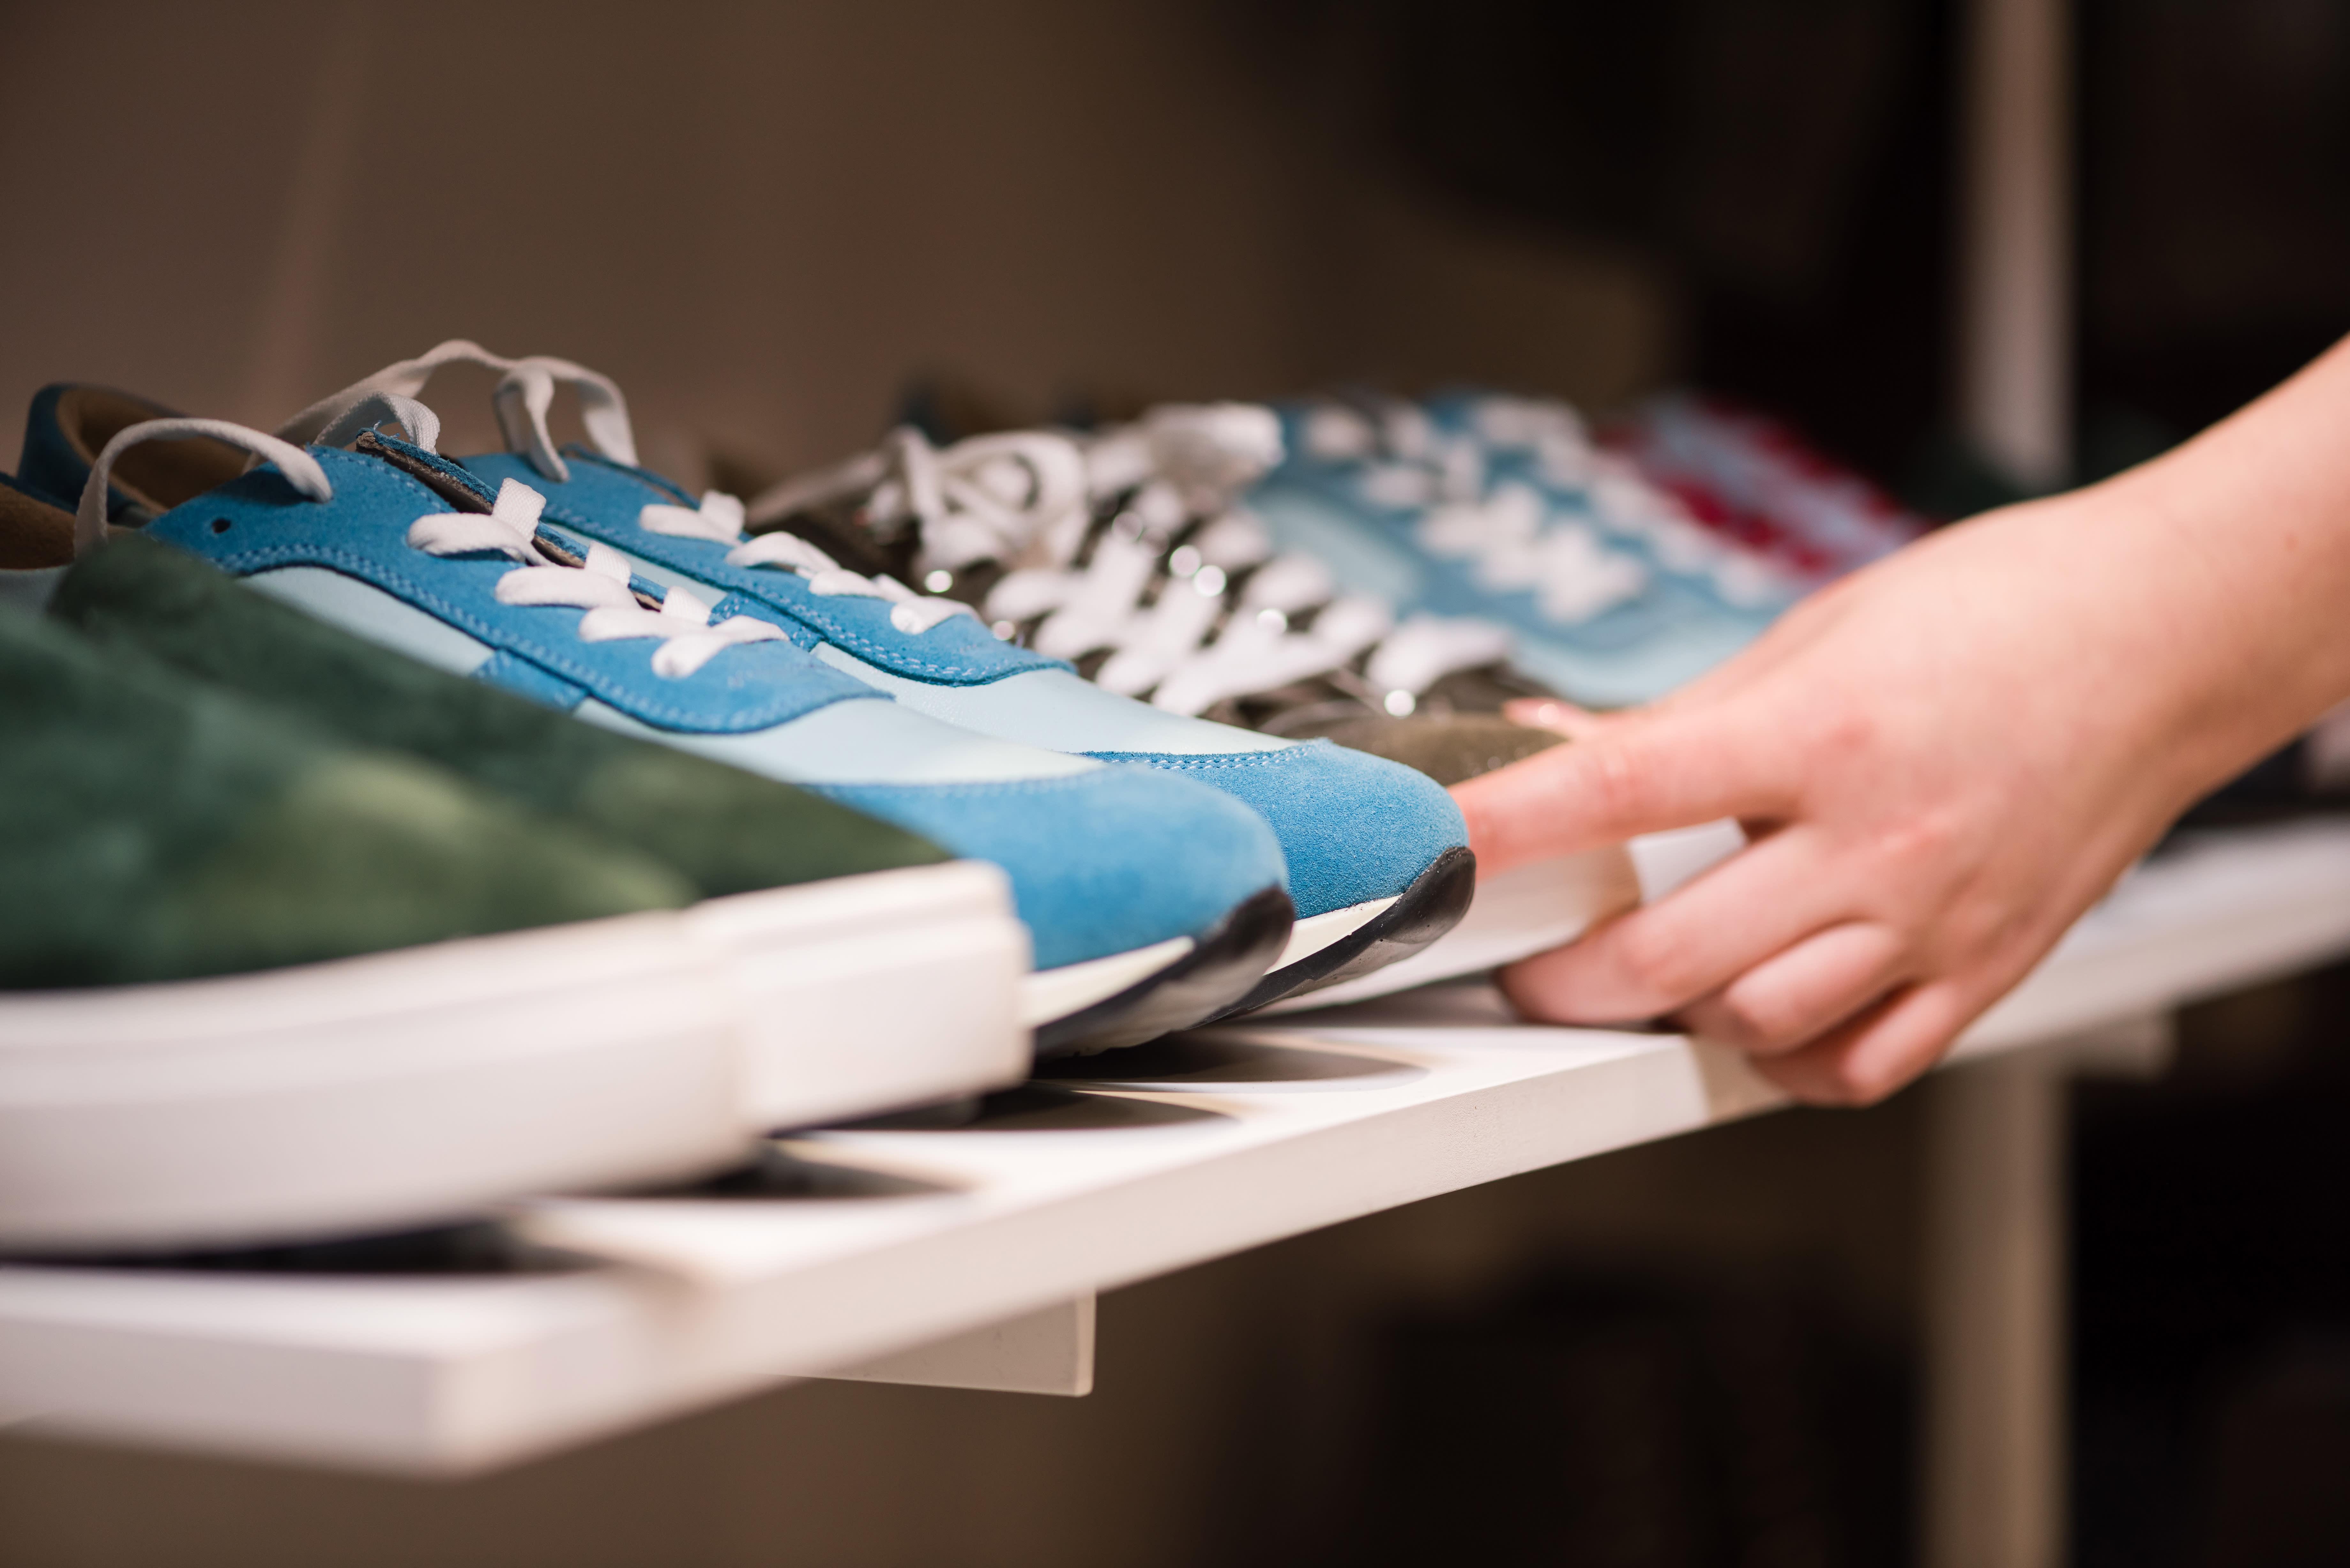 Schuh Modell geht viral: Sneaker erinnern angeblich an Adolf